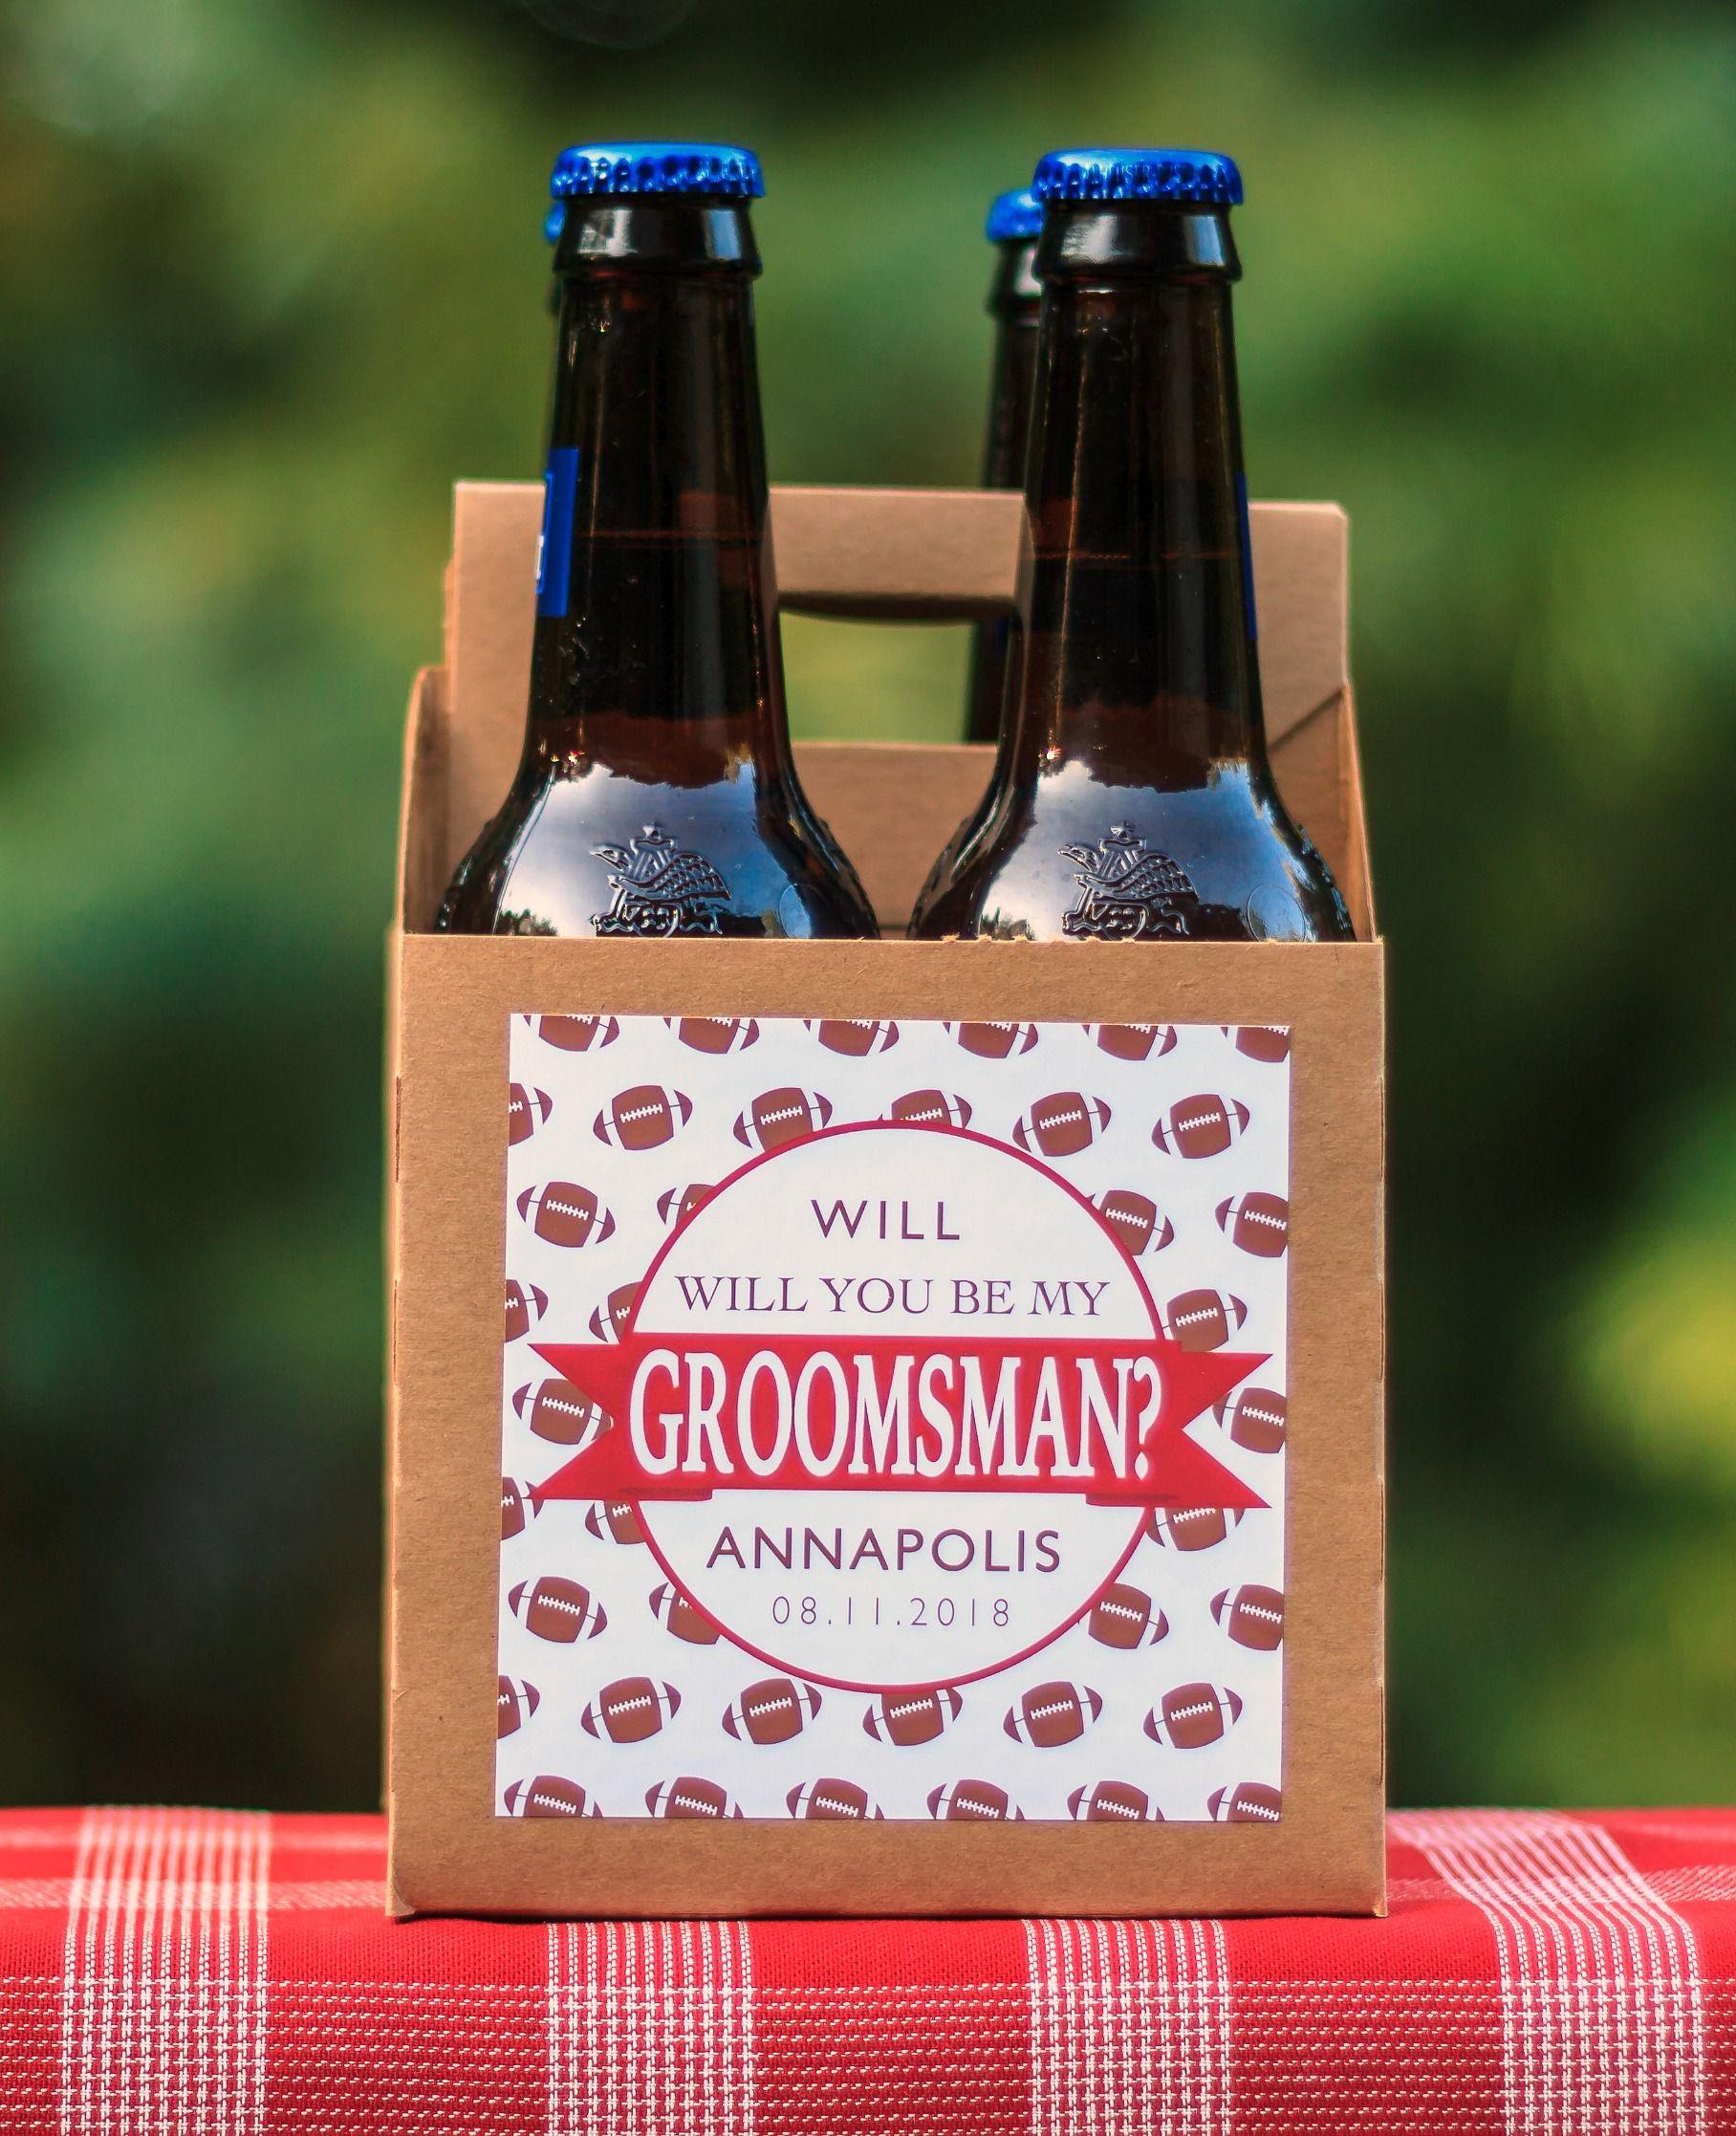 Wedding Announcement Ideas Asking Groomsman Groomsmen Proposal P1187 Personalized Groomsman Puzzle Will You Be My Groomsman